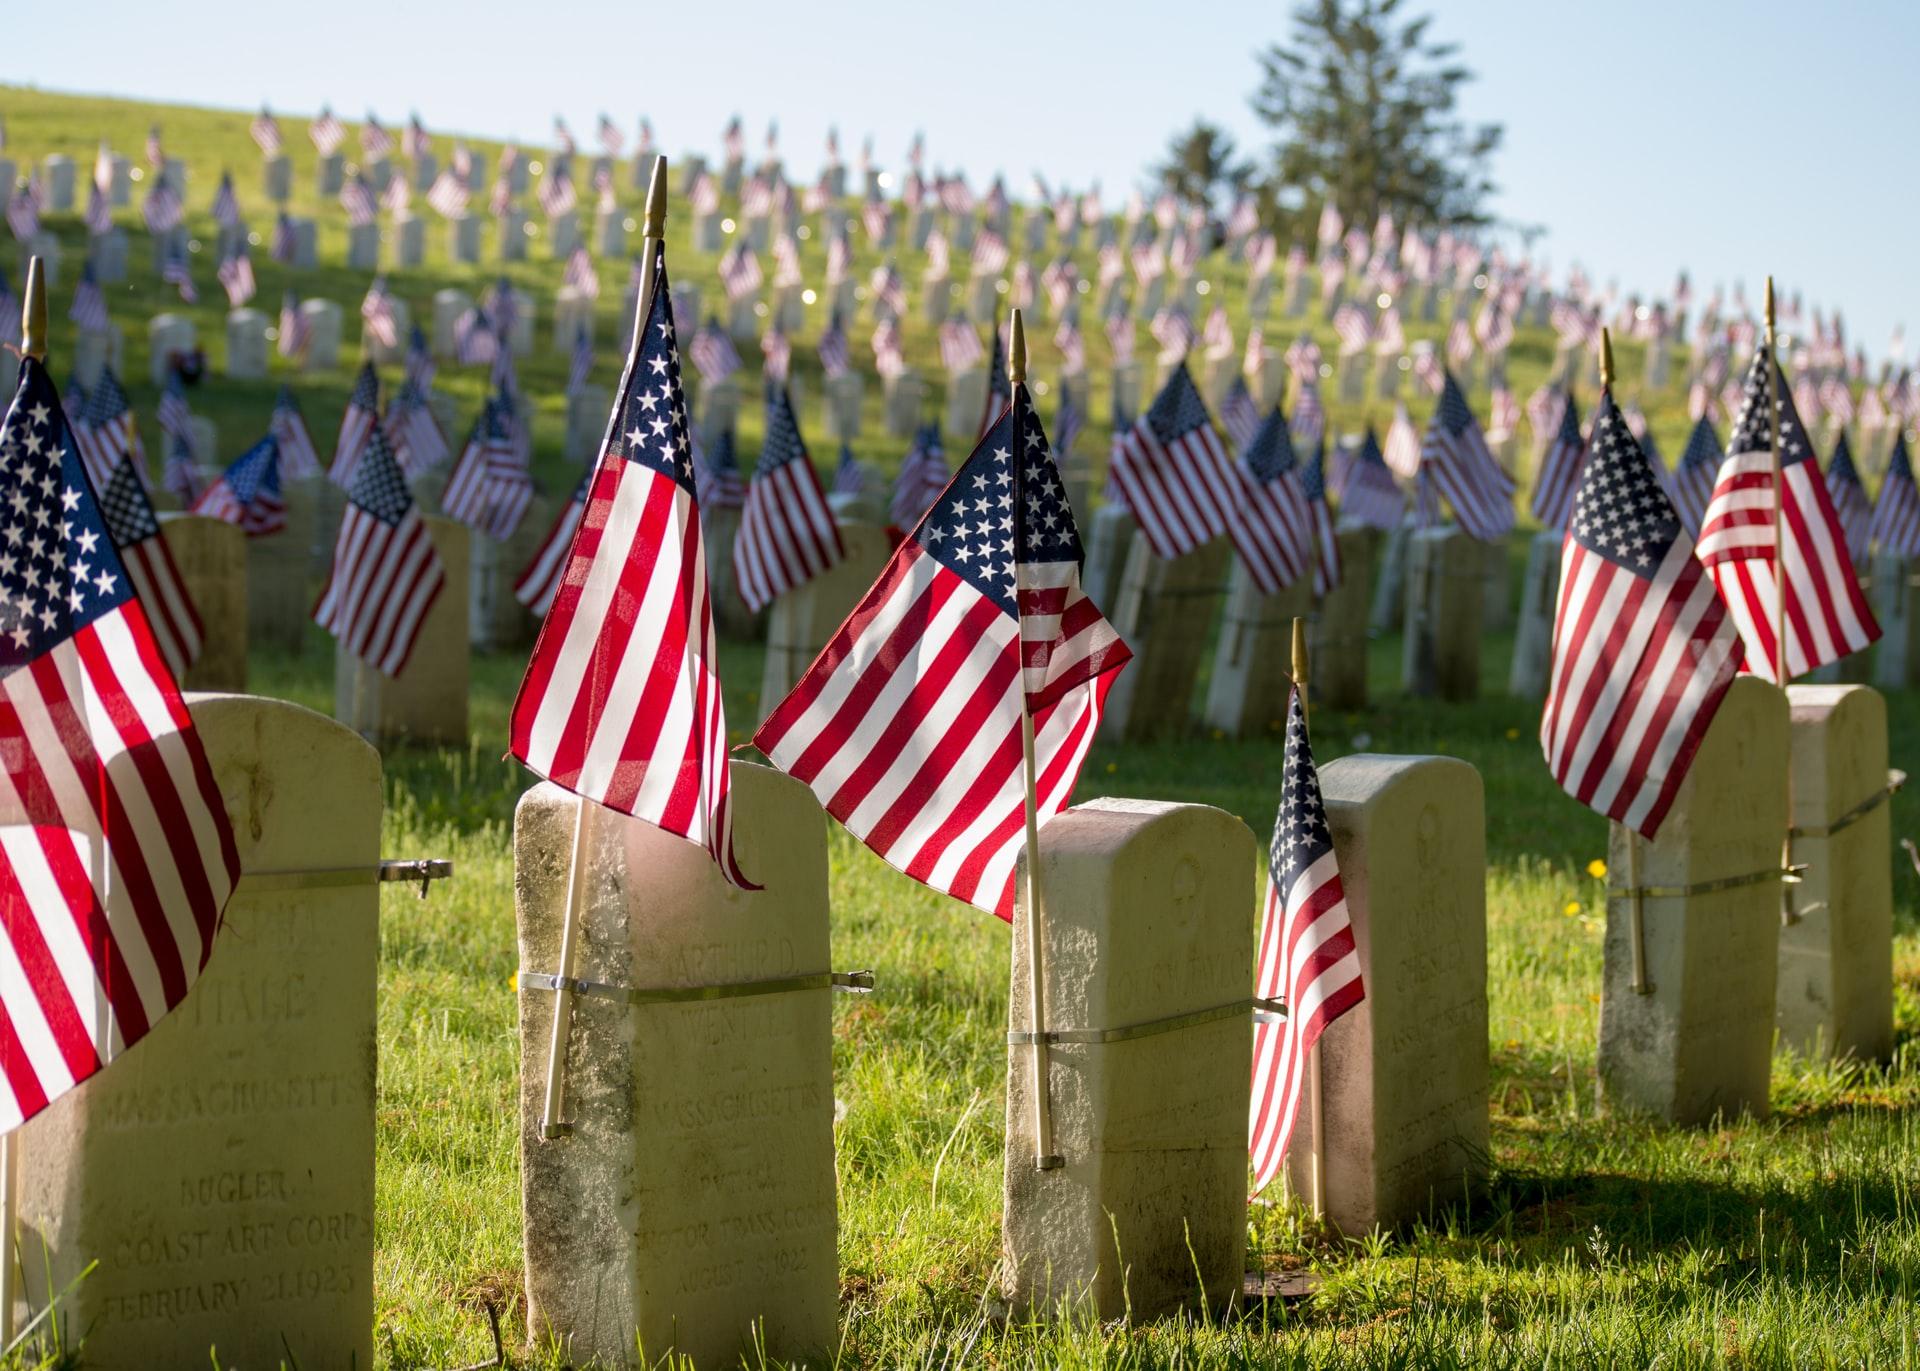 American flags on cemetery headstones